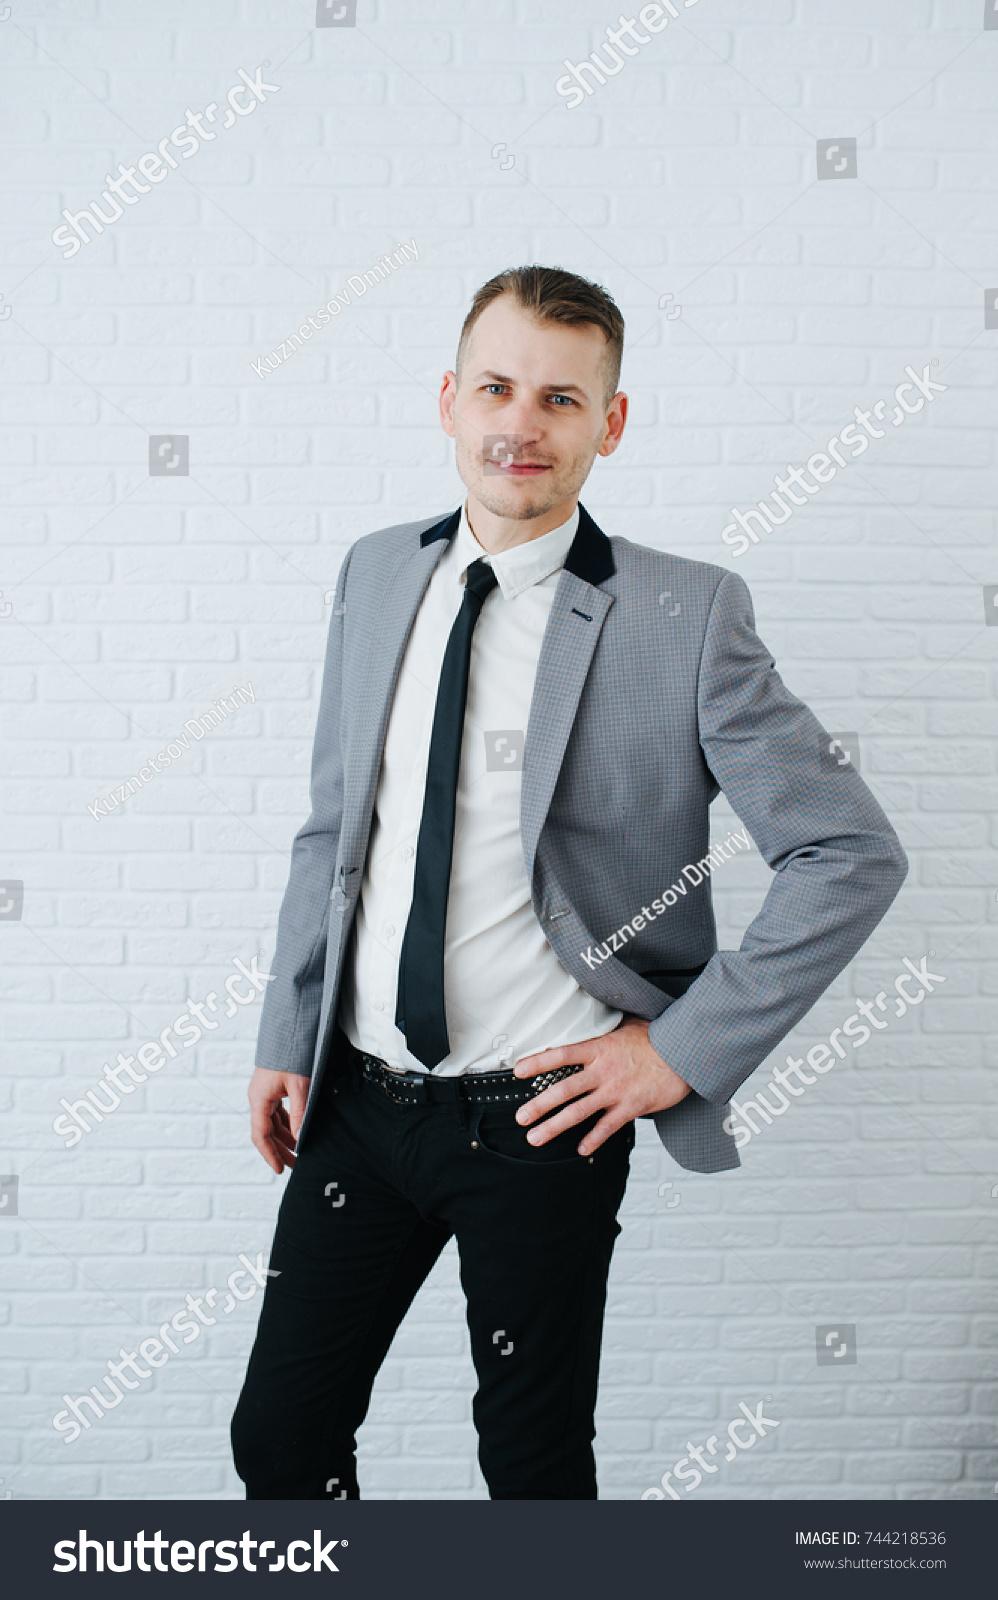 Portrait Confident Handsome Man Grey Suit Stock Photo (Royalty Free ...